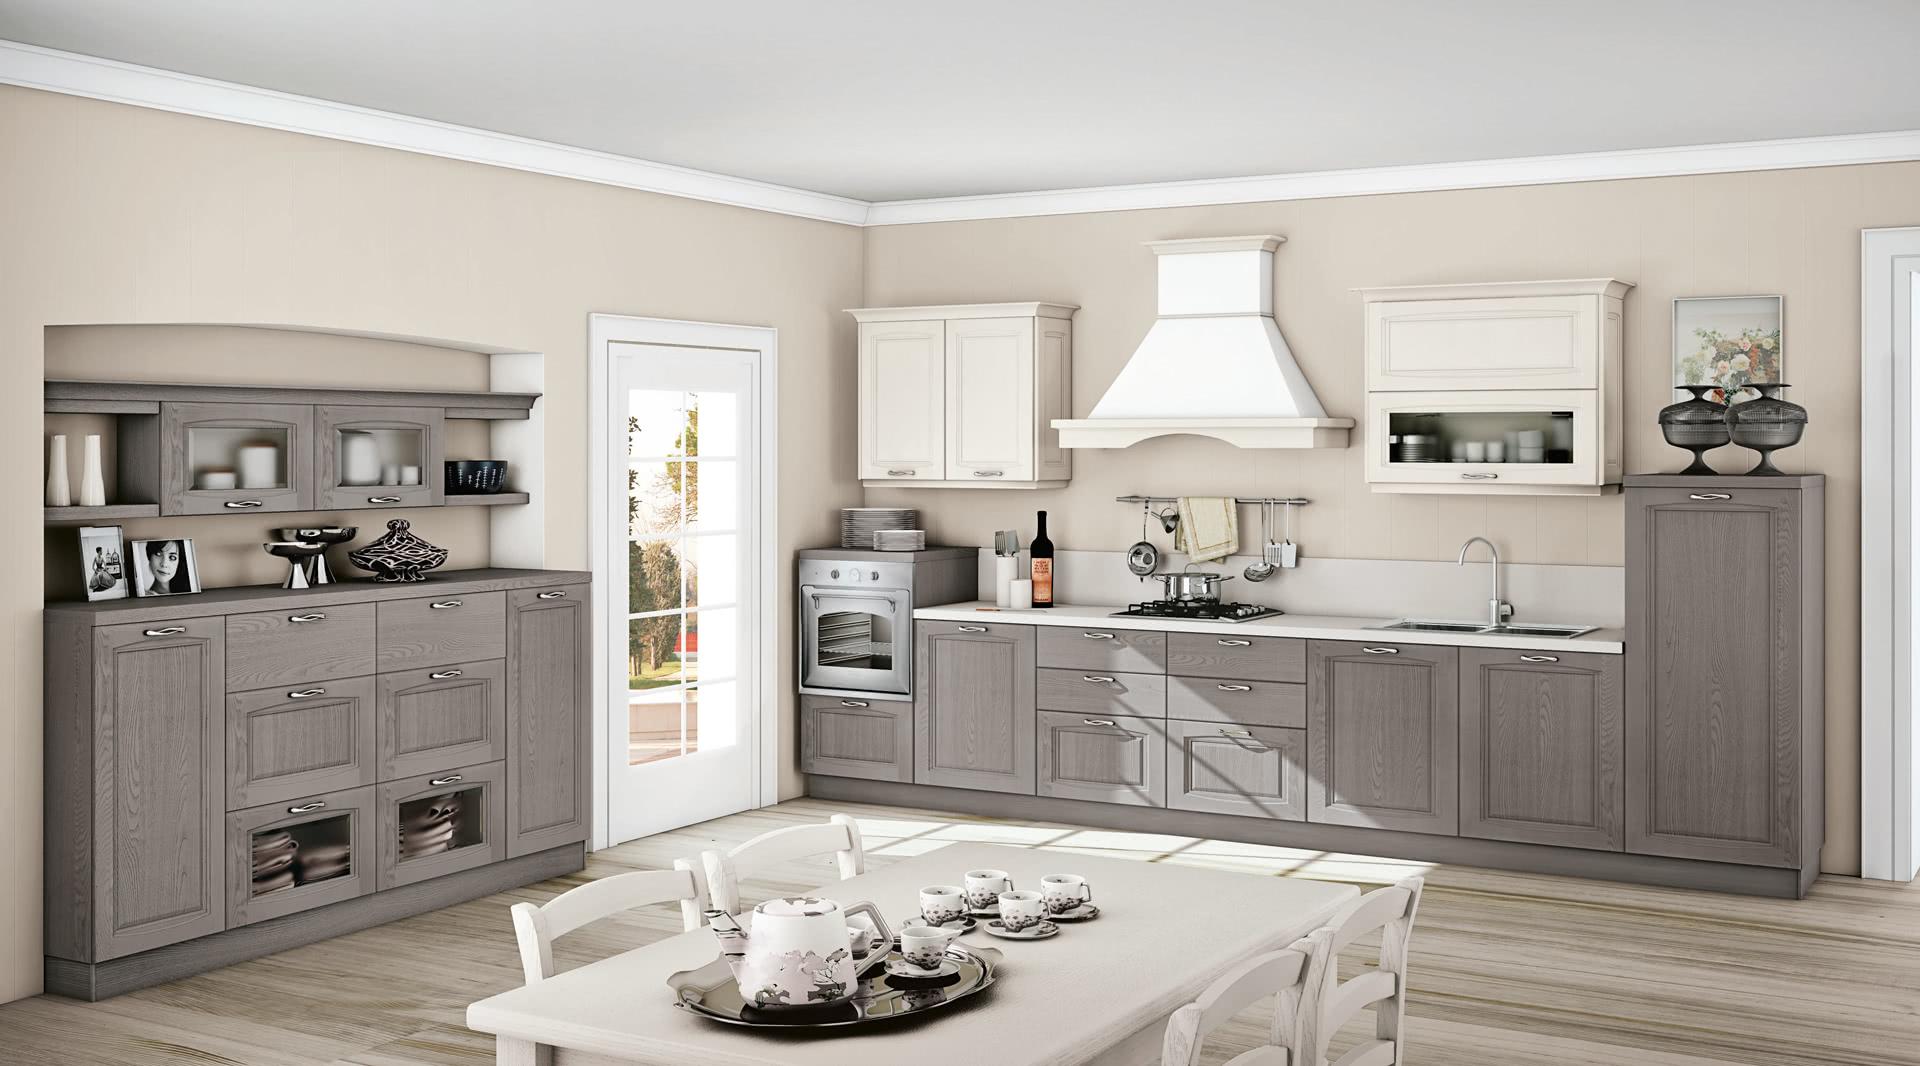 1420_raila-cucina-ambientata-1